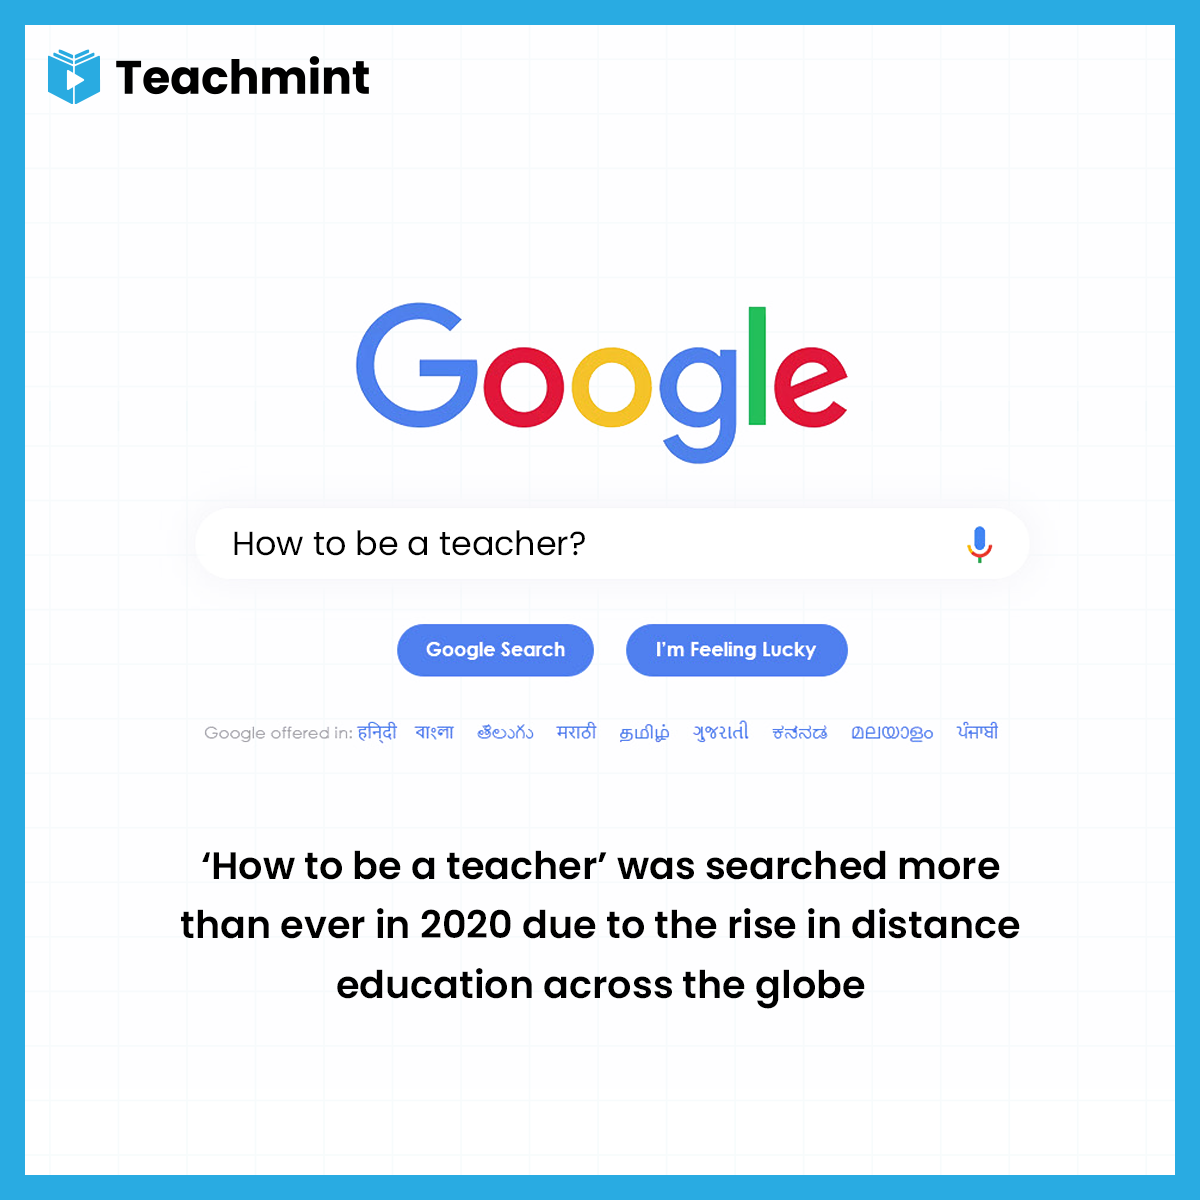 online teaching; online teaching jobs: teacher: teaching:how to teach